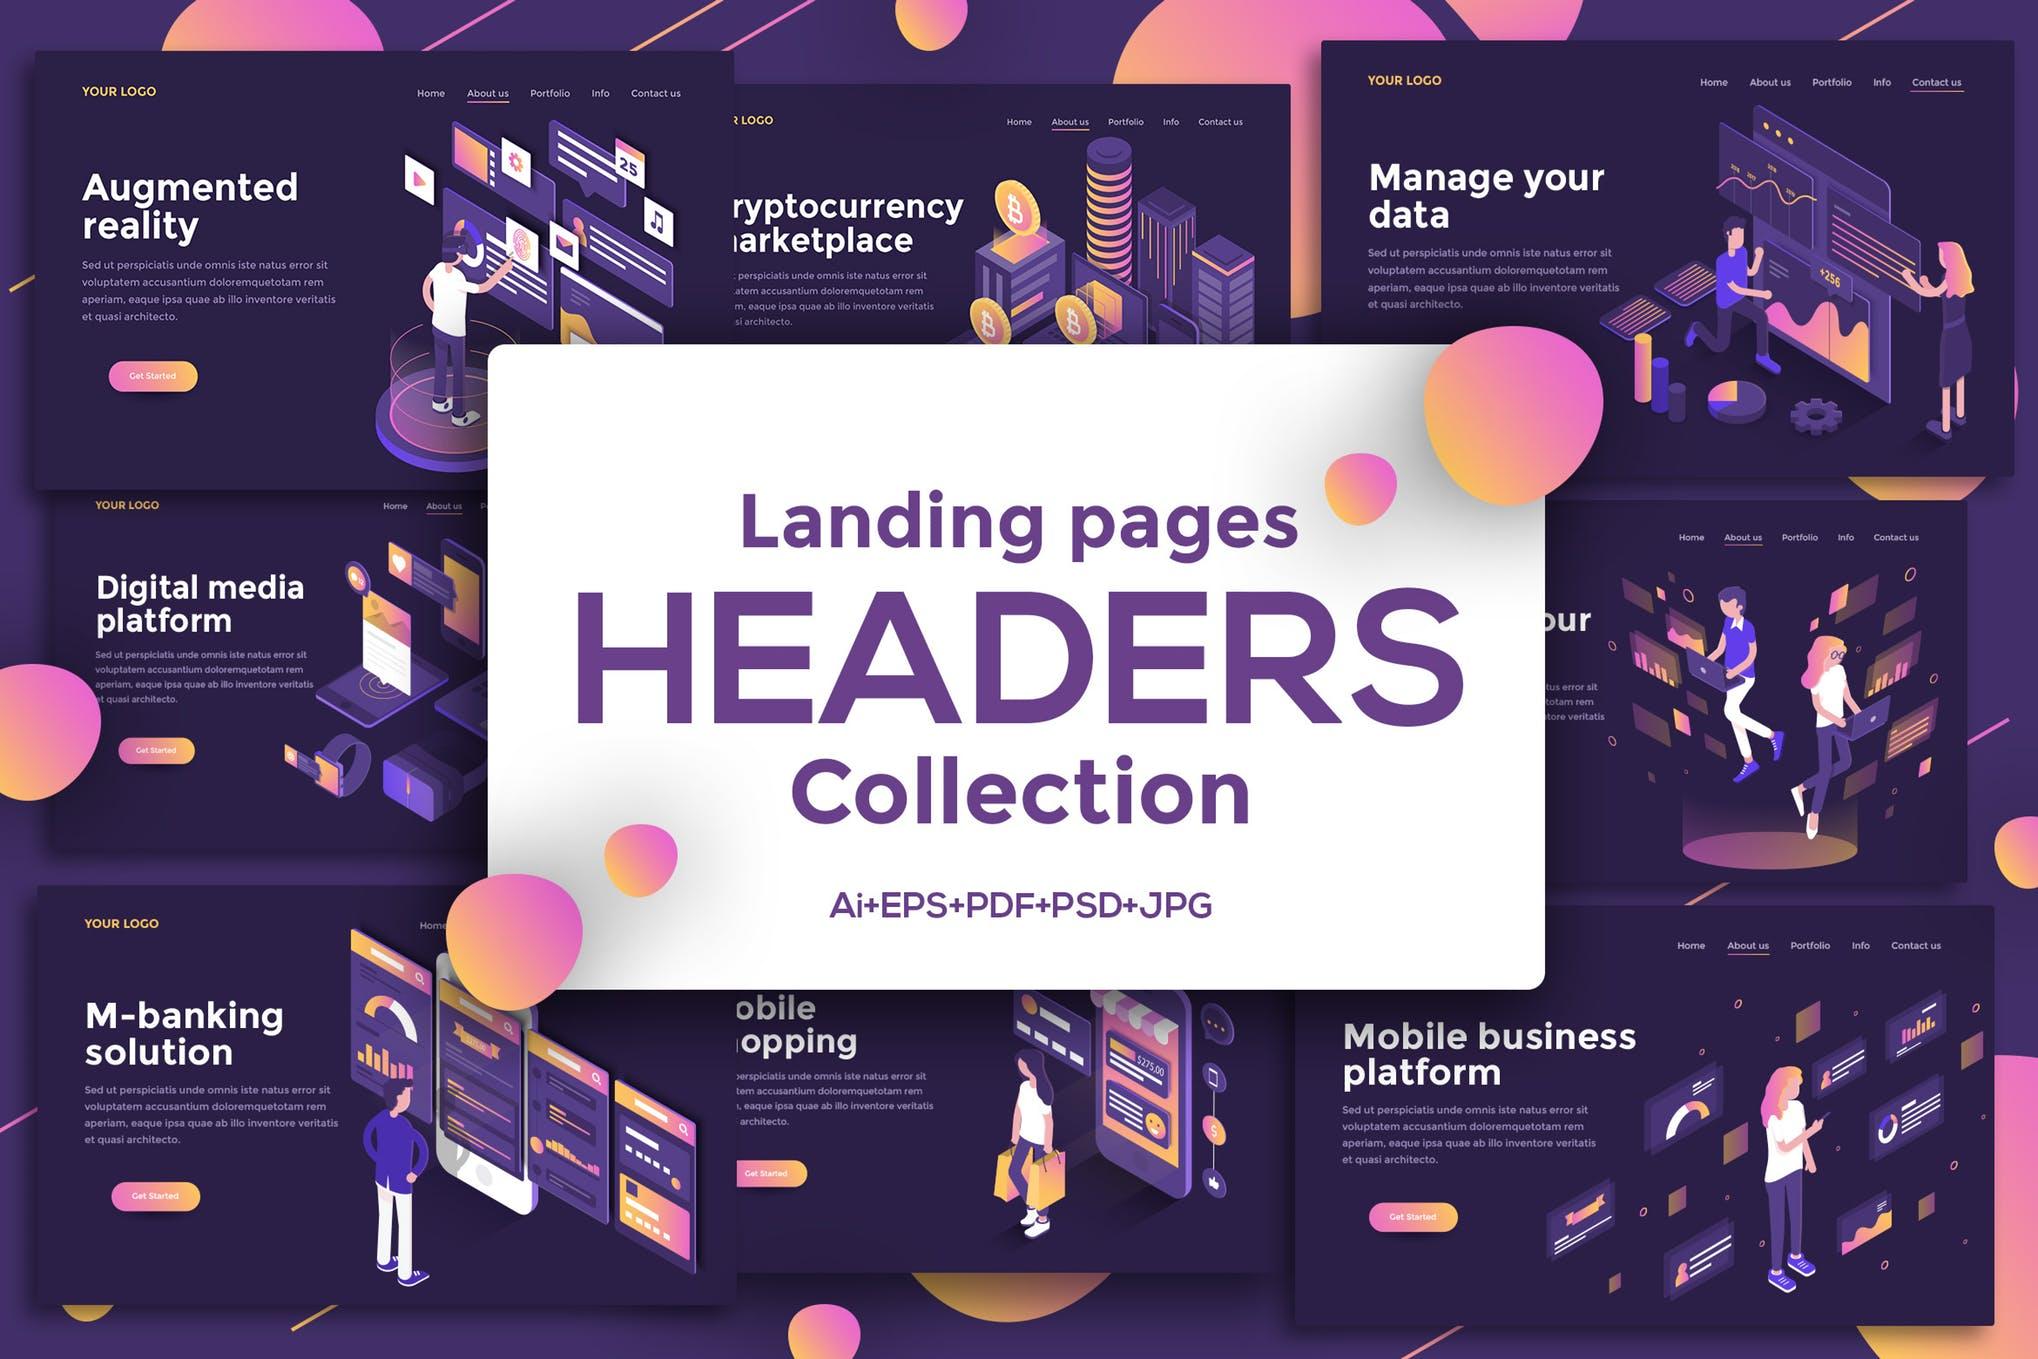 WEB端2.5D卡通人物城市场景插画风格 比特币金融行业UI Landing page templates, dark theme